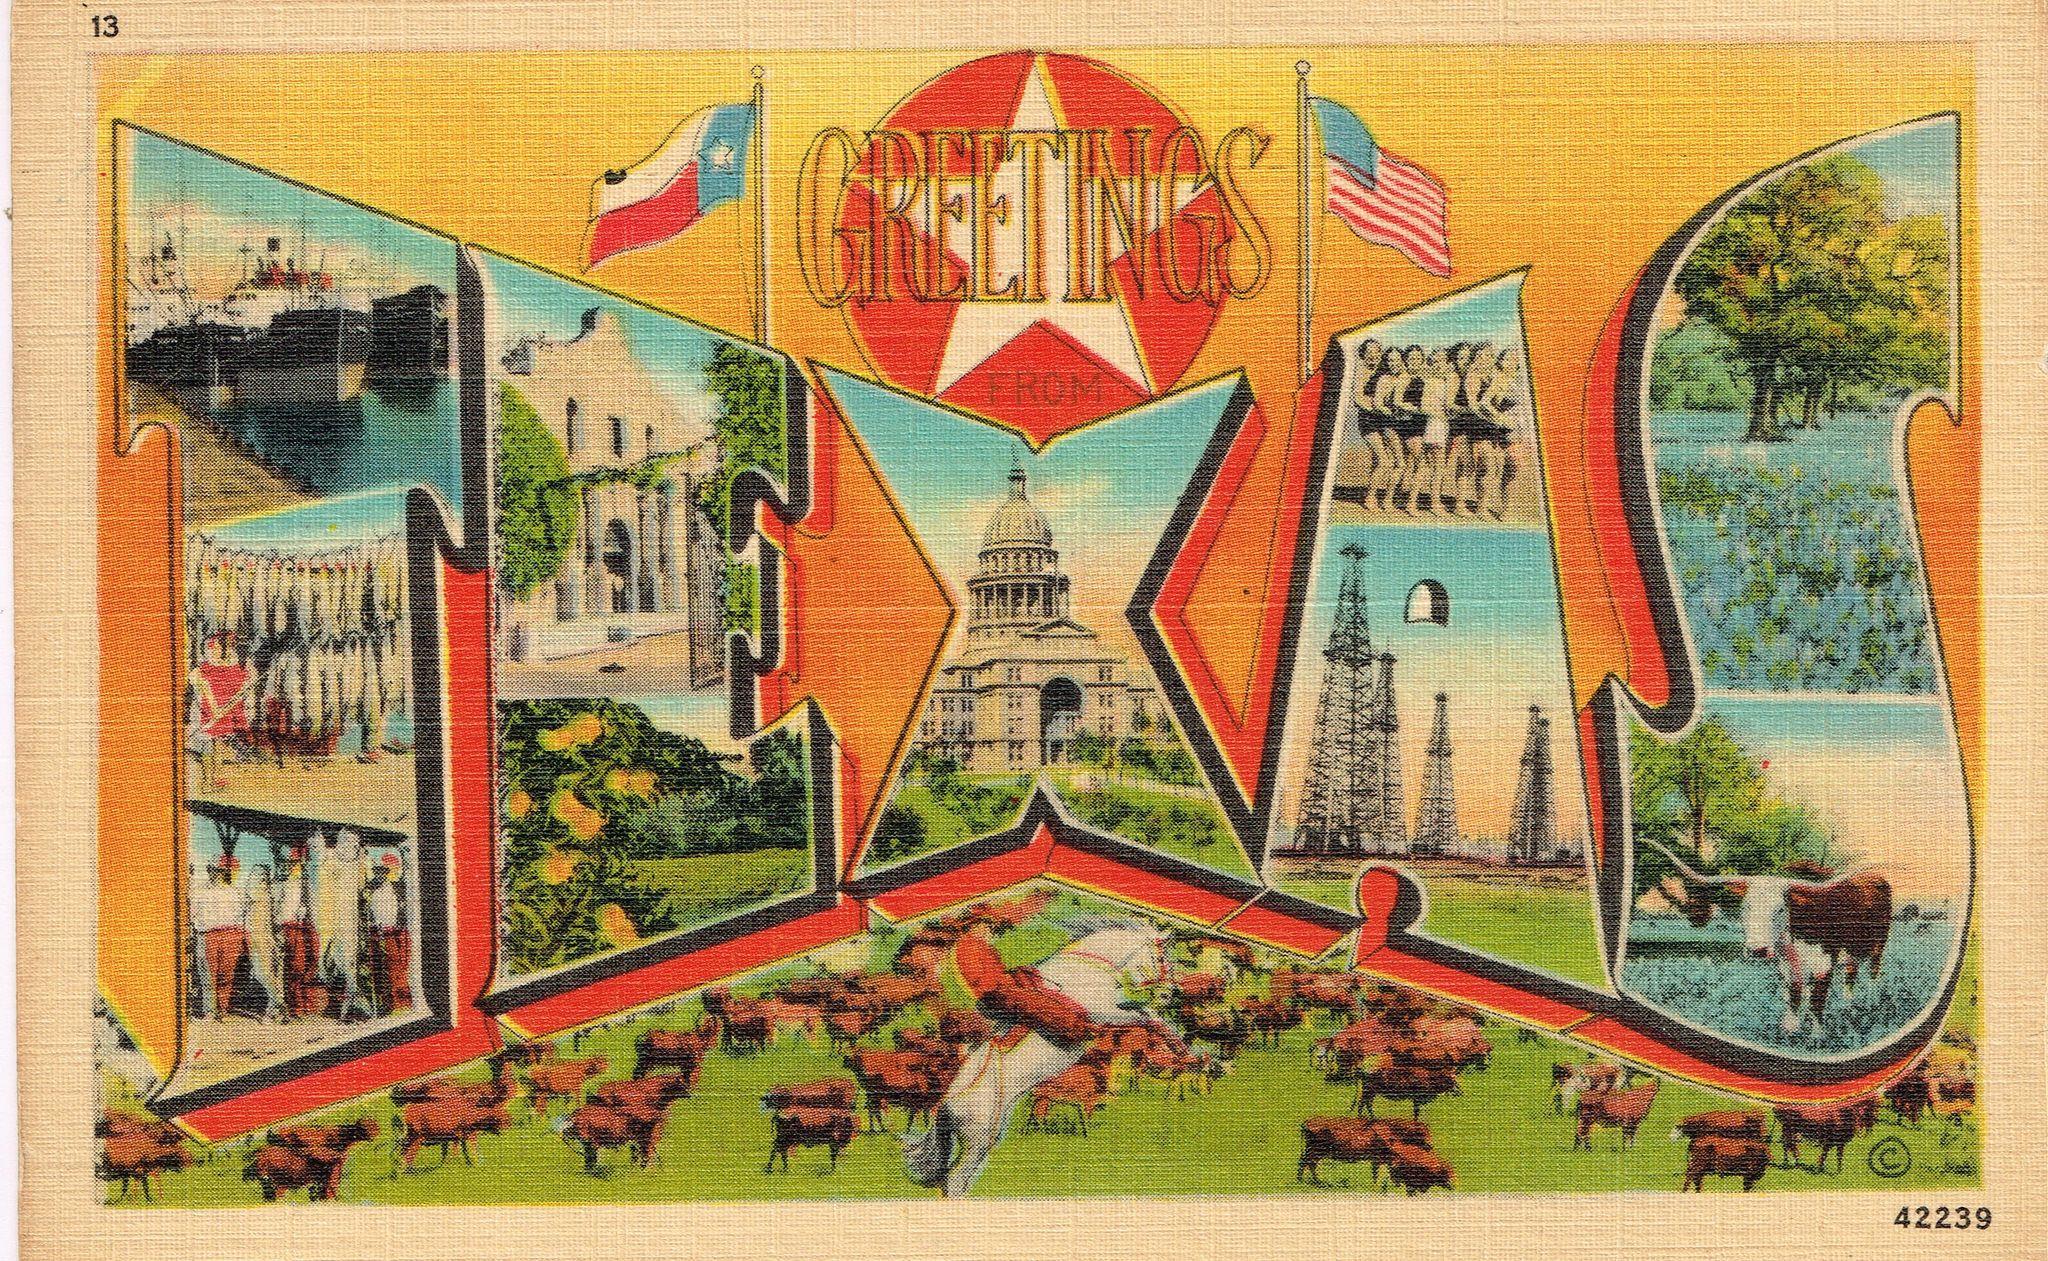 Postcards san antonio vintage postcards and texas vintage postcards greetings from texas published by san antonio card co kristyandbryce Choice Image